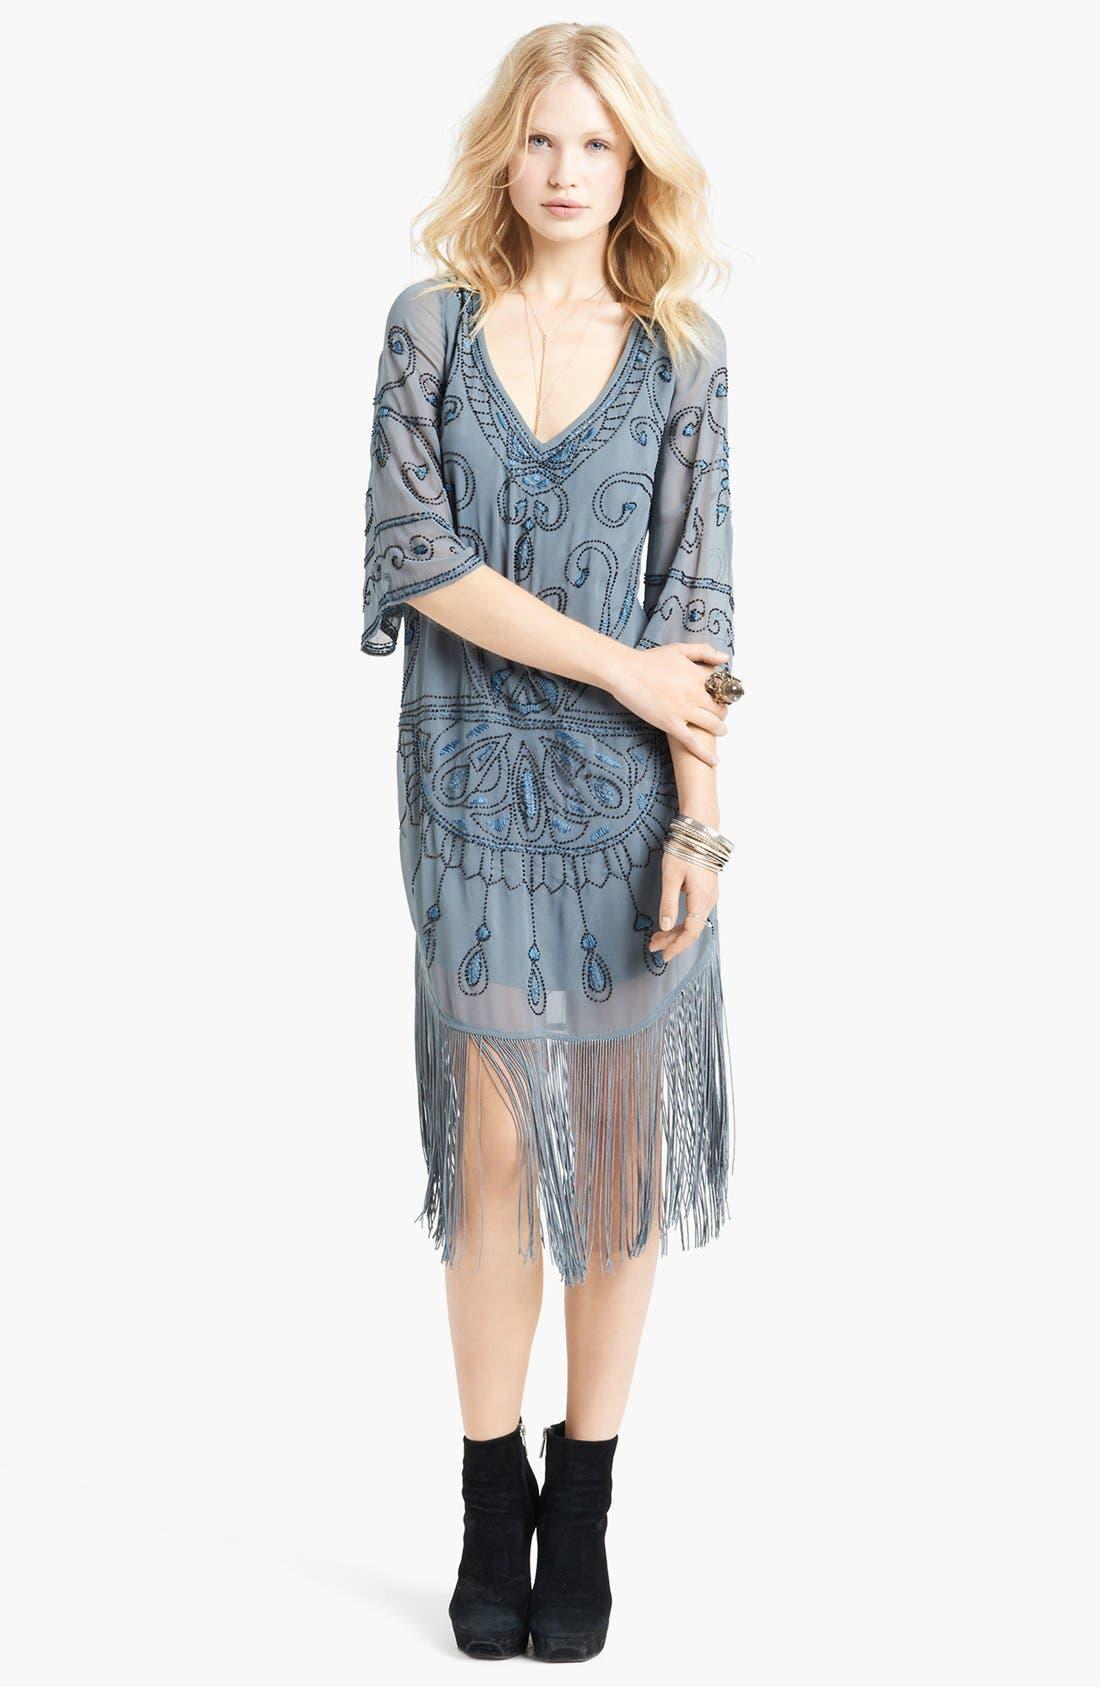 Alternate Image 1 Selected - Free People 'Livin' the Fringe Life' Embellished Dress